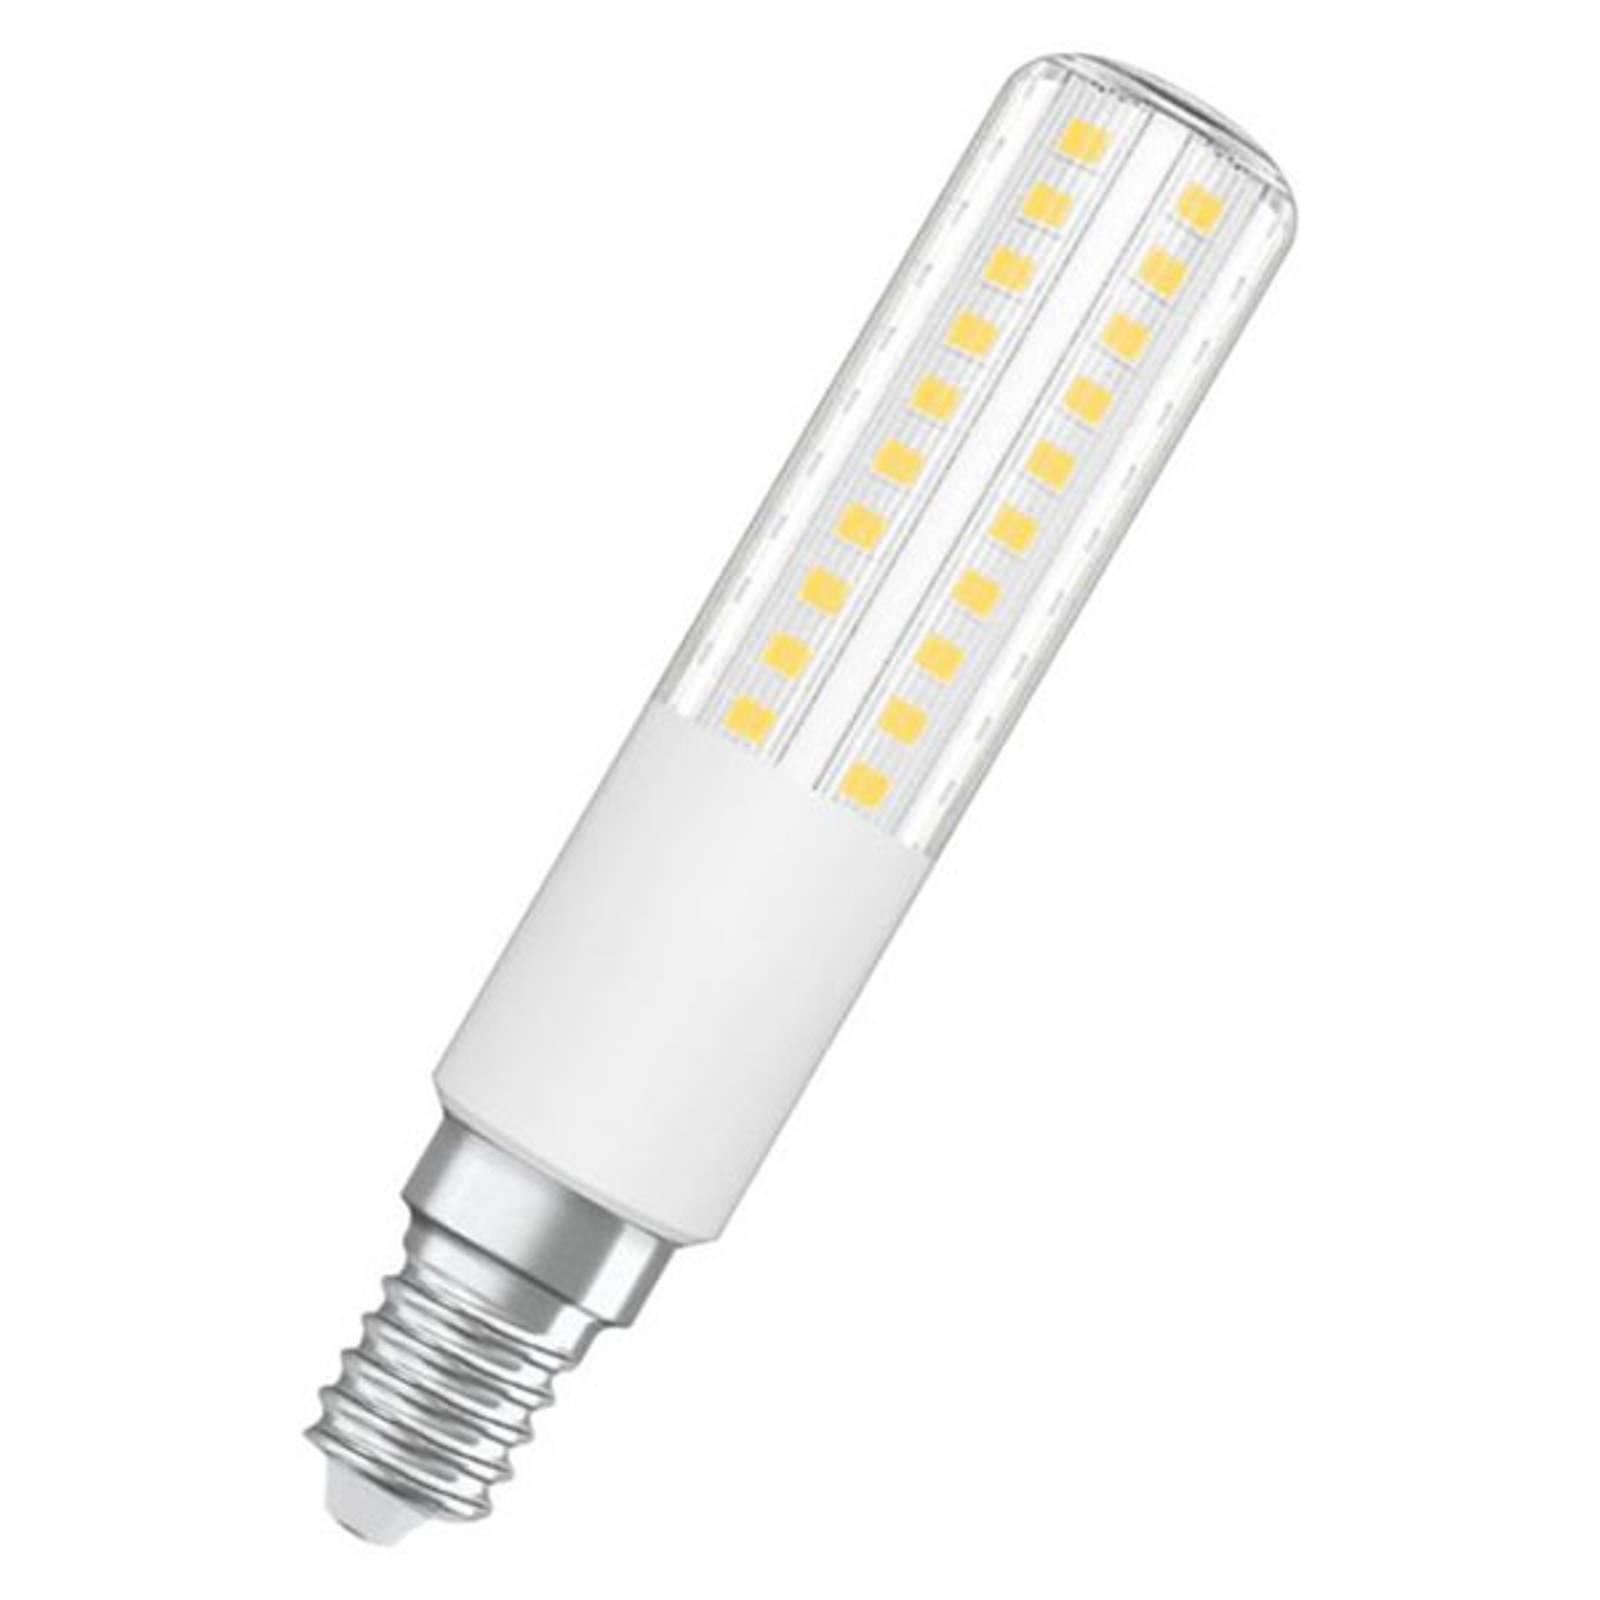 OSRAM-LED-lamppu Special T E14 7W 2 700 K dim